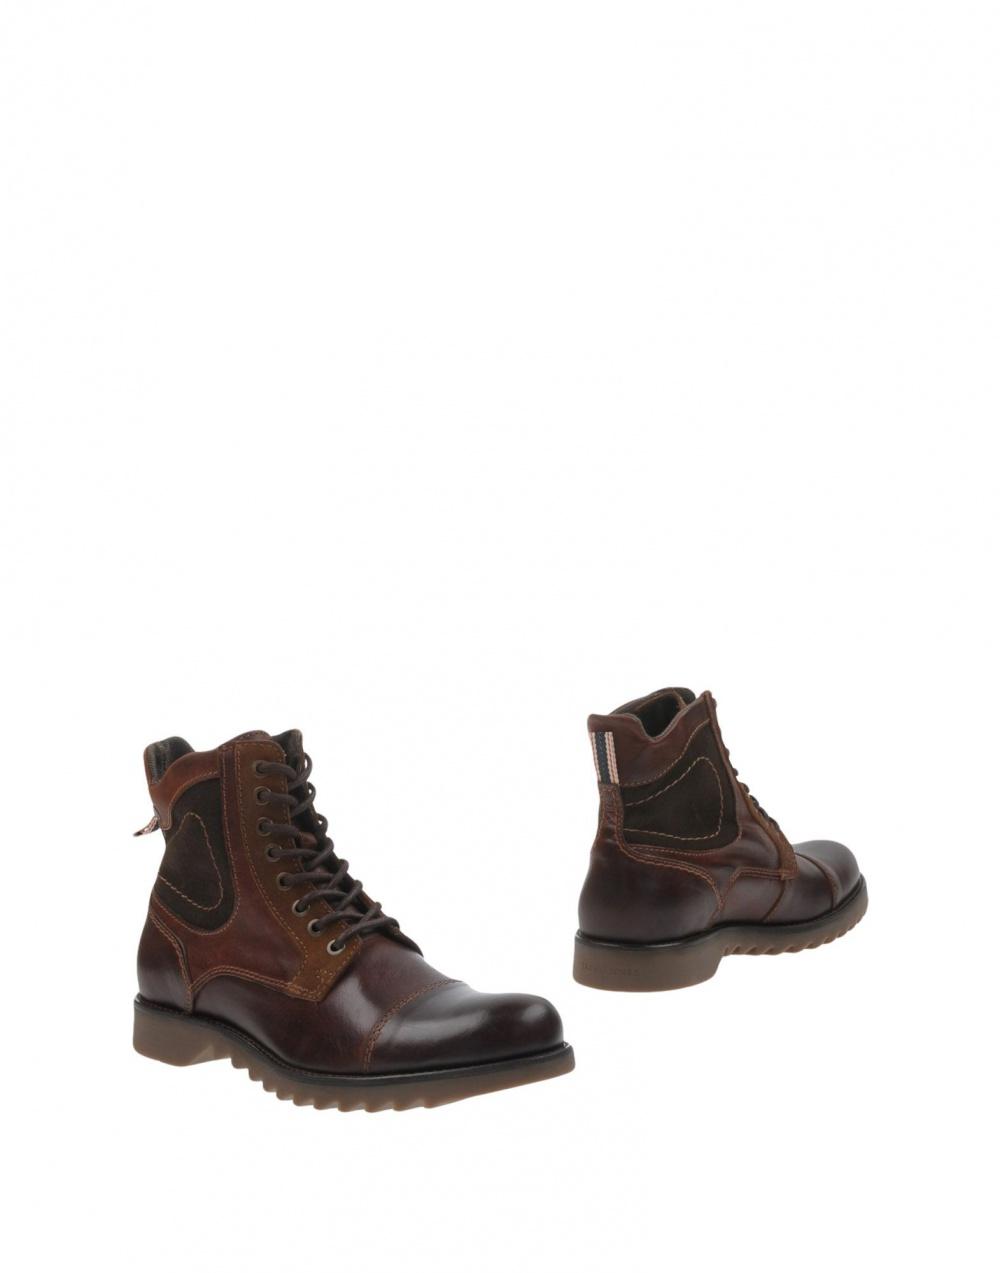 Мужские ботинки  JACK & JONES 43-44 р-р